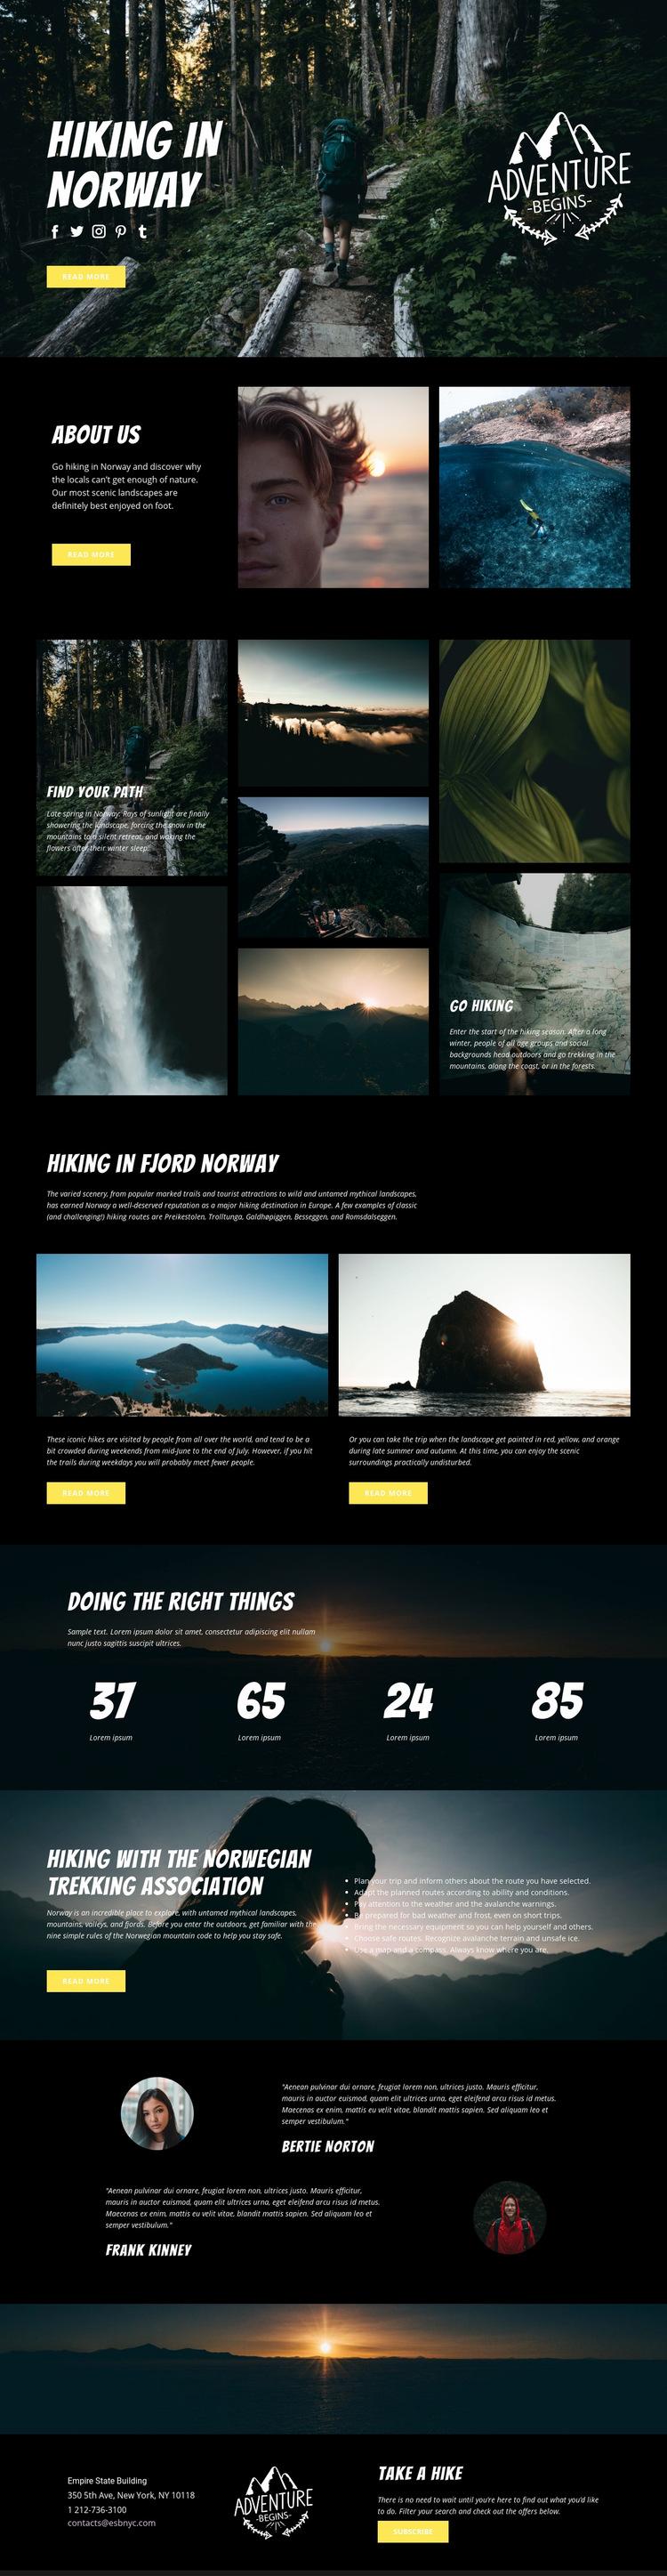 Norway Web Page Design